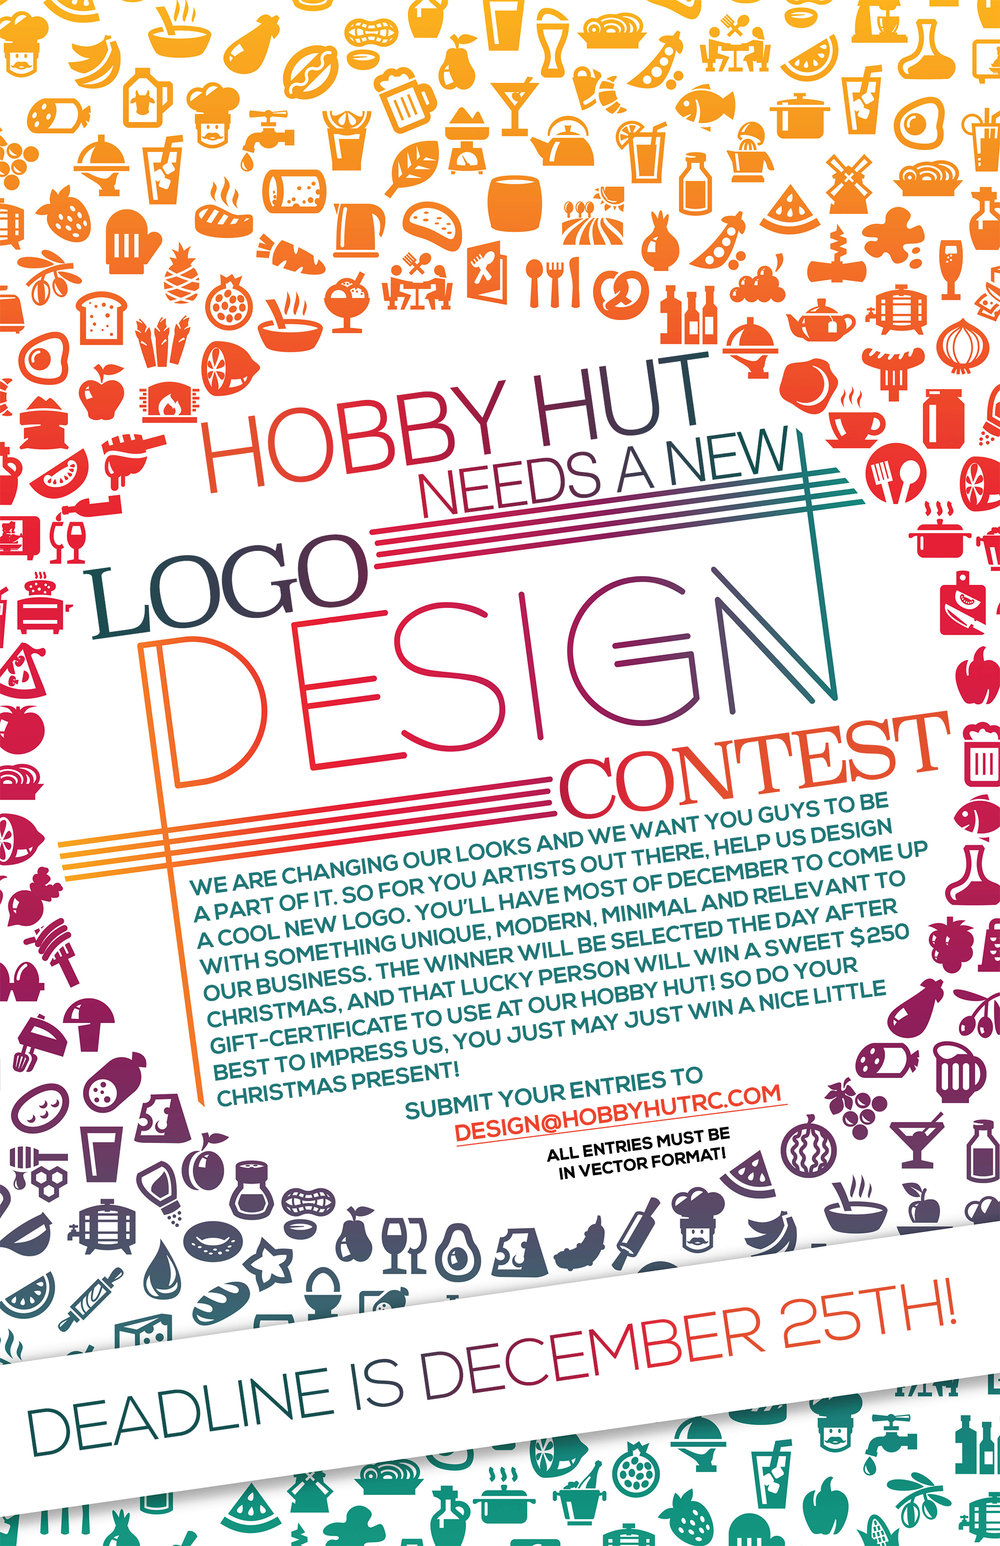 hobby_hut-logo_contest_artwork-large.jpg